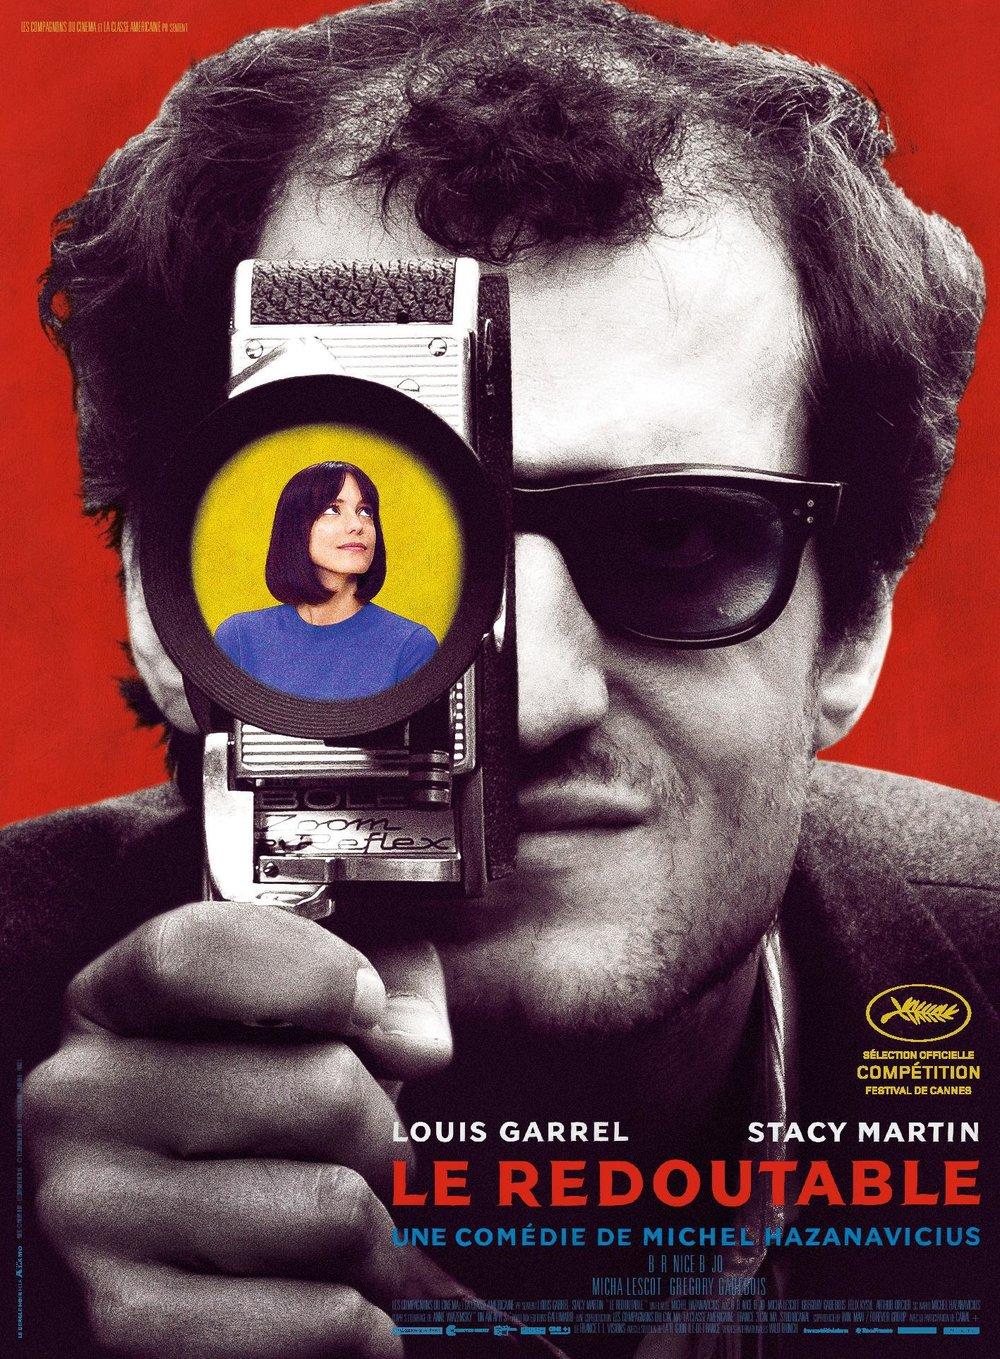 redoubtable film poster michel hazanavicius